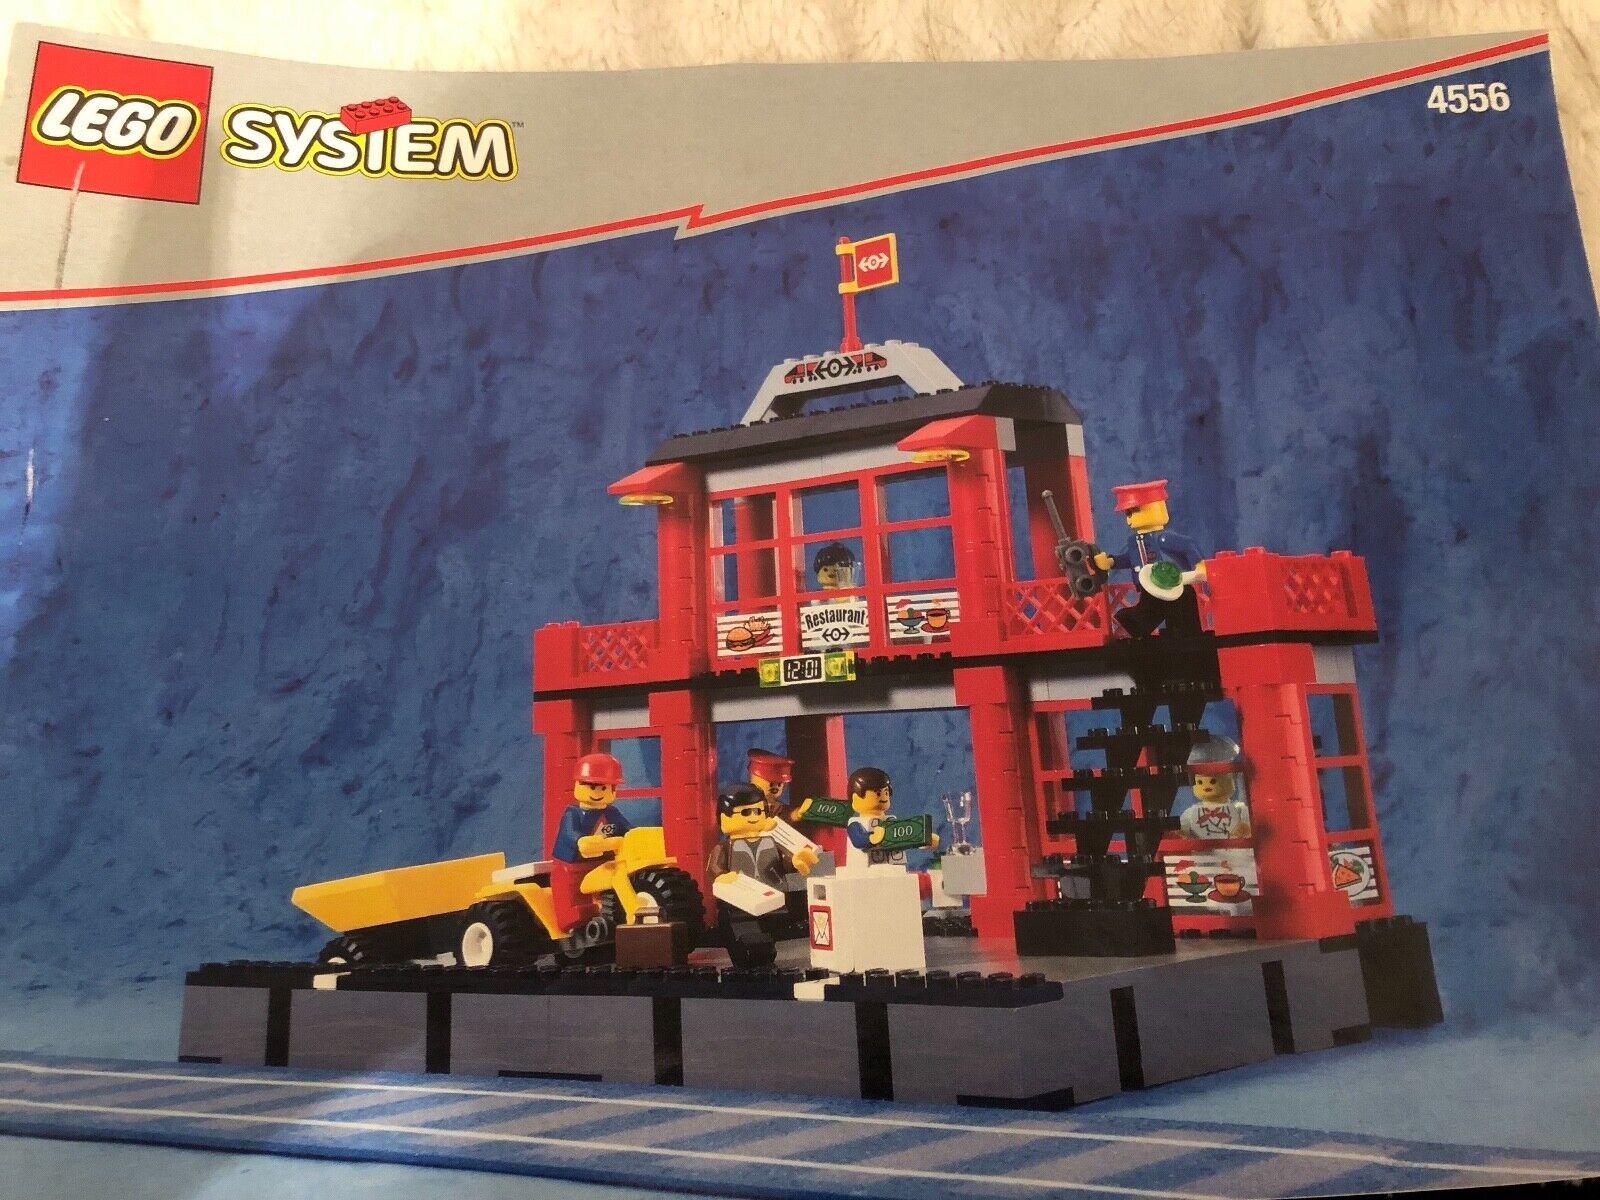 Lego system set 4556, railway city train station, RARE